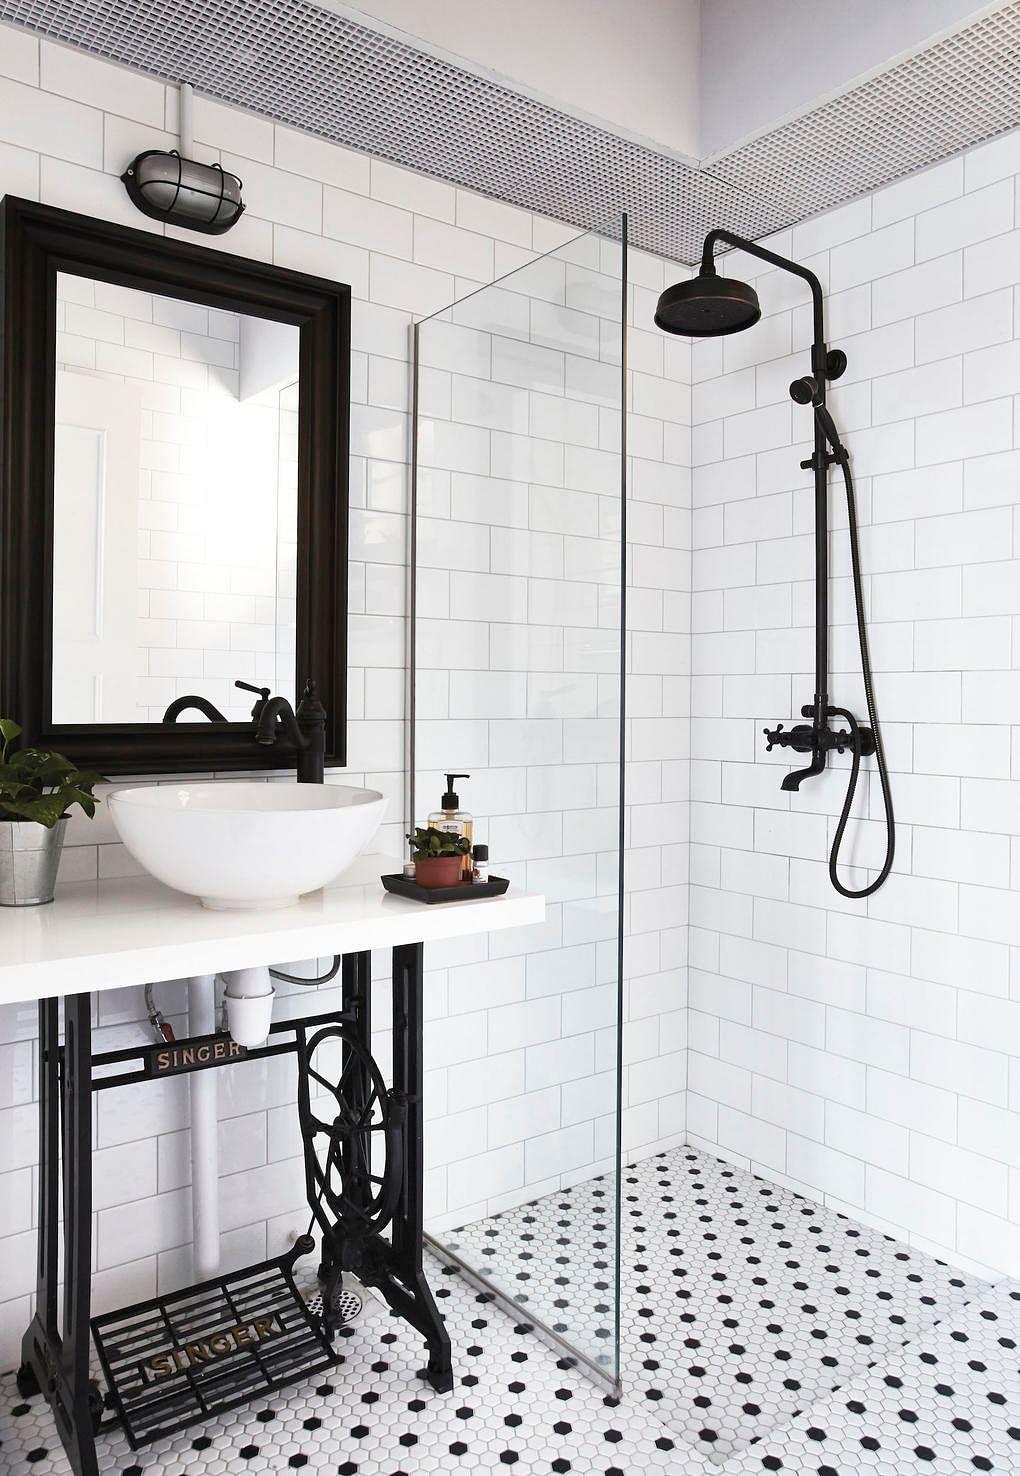 12 interesting yet simple bathroom designs   Home & Decor ...